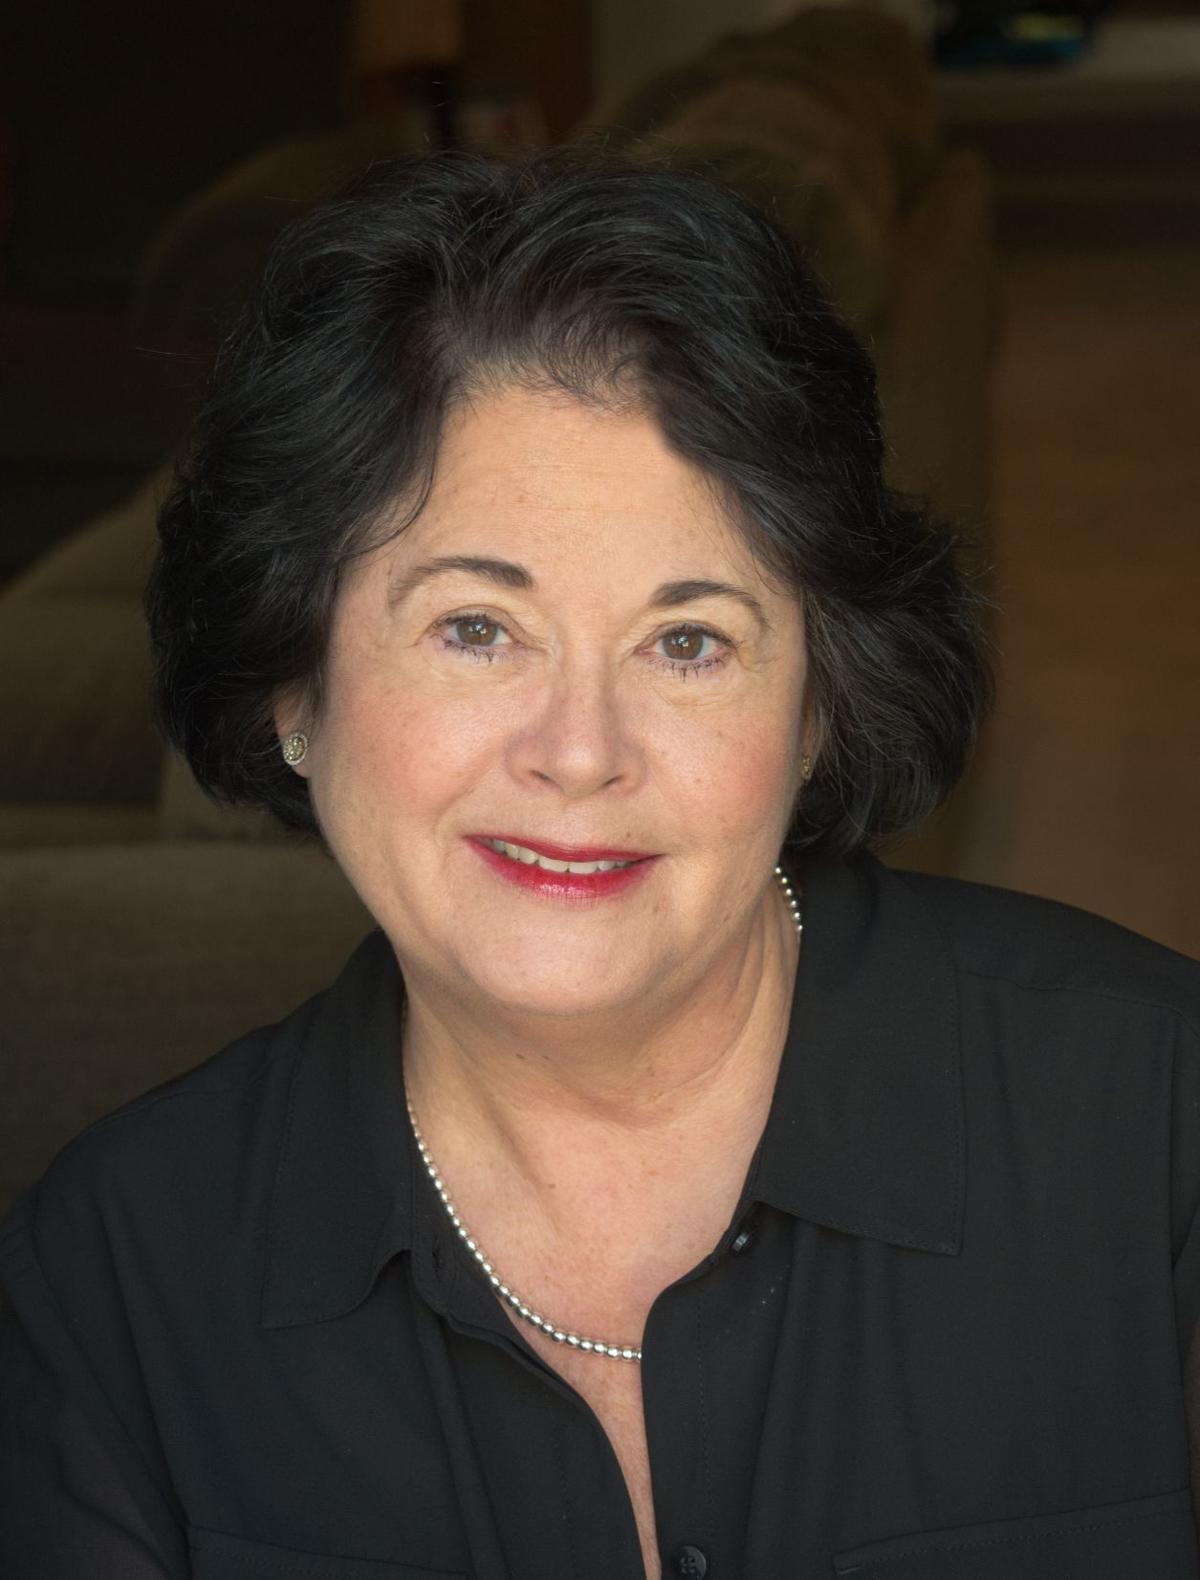 Linda Reinstein, president CEO, Asbestos Disease Awareness Organization